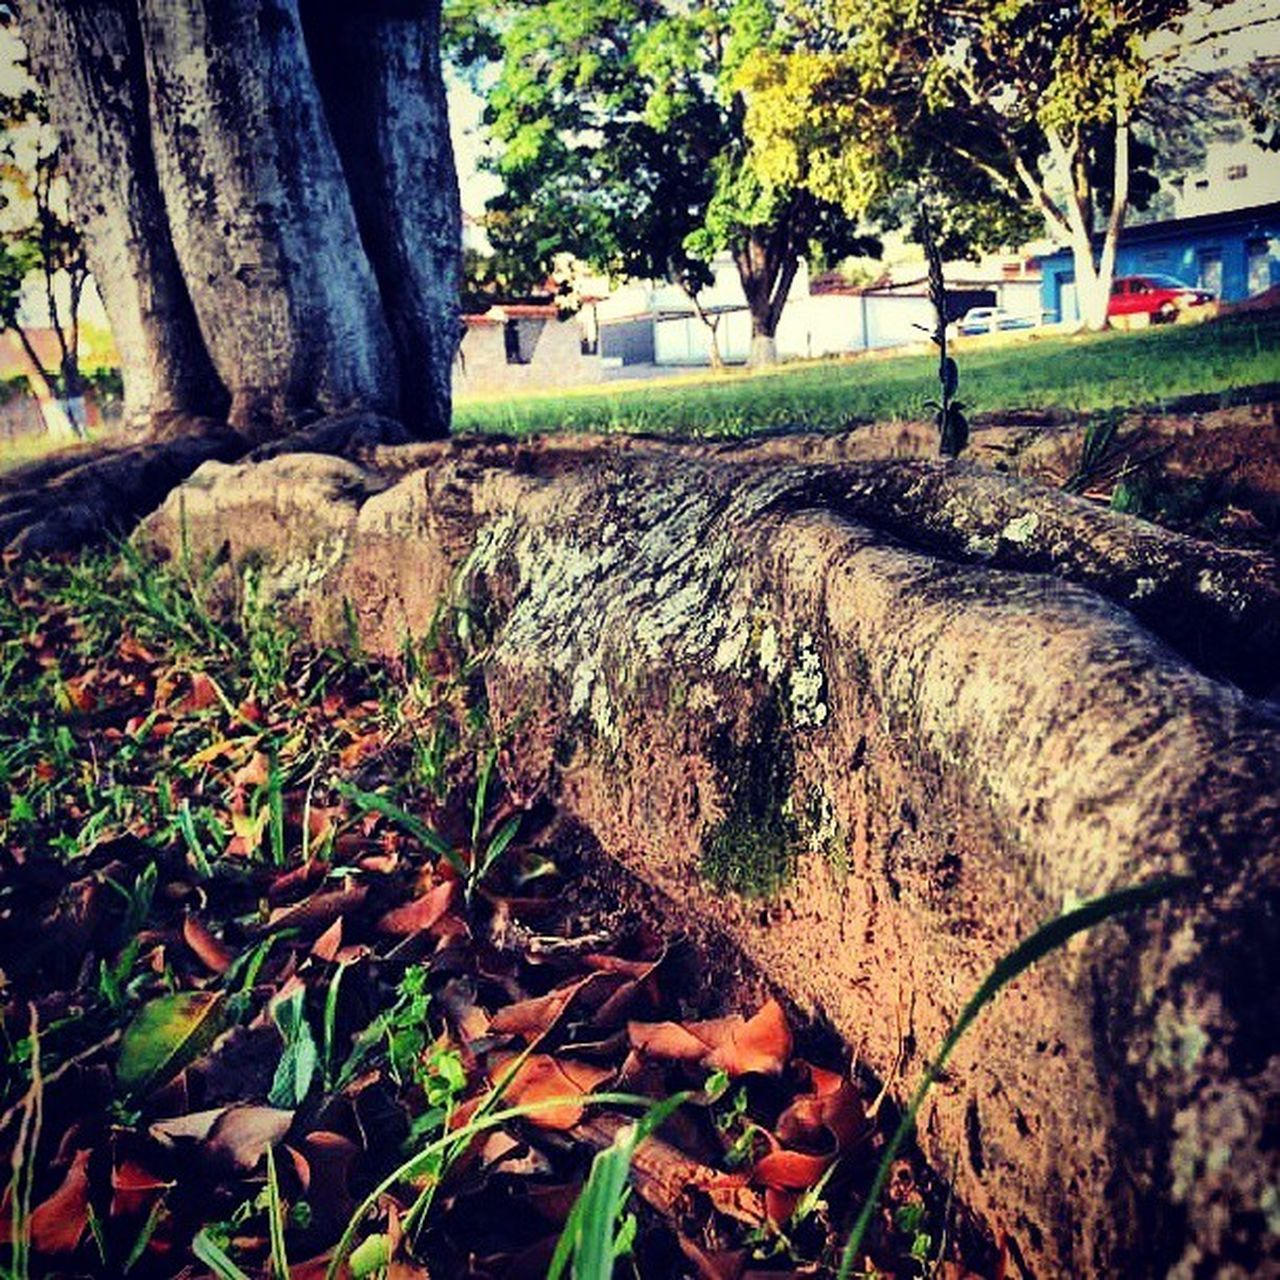 Dotspin Betosalvestrini Art Original Natural Nature Flowers Plants Peace Quickshoot Venezuela Sanjuandecolon